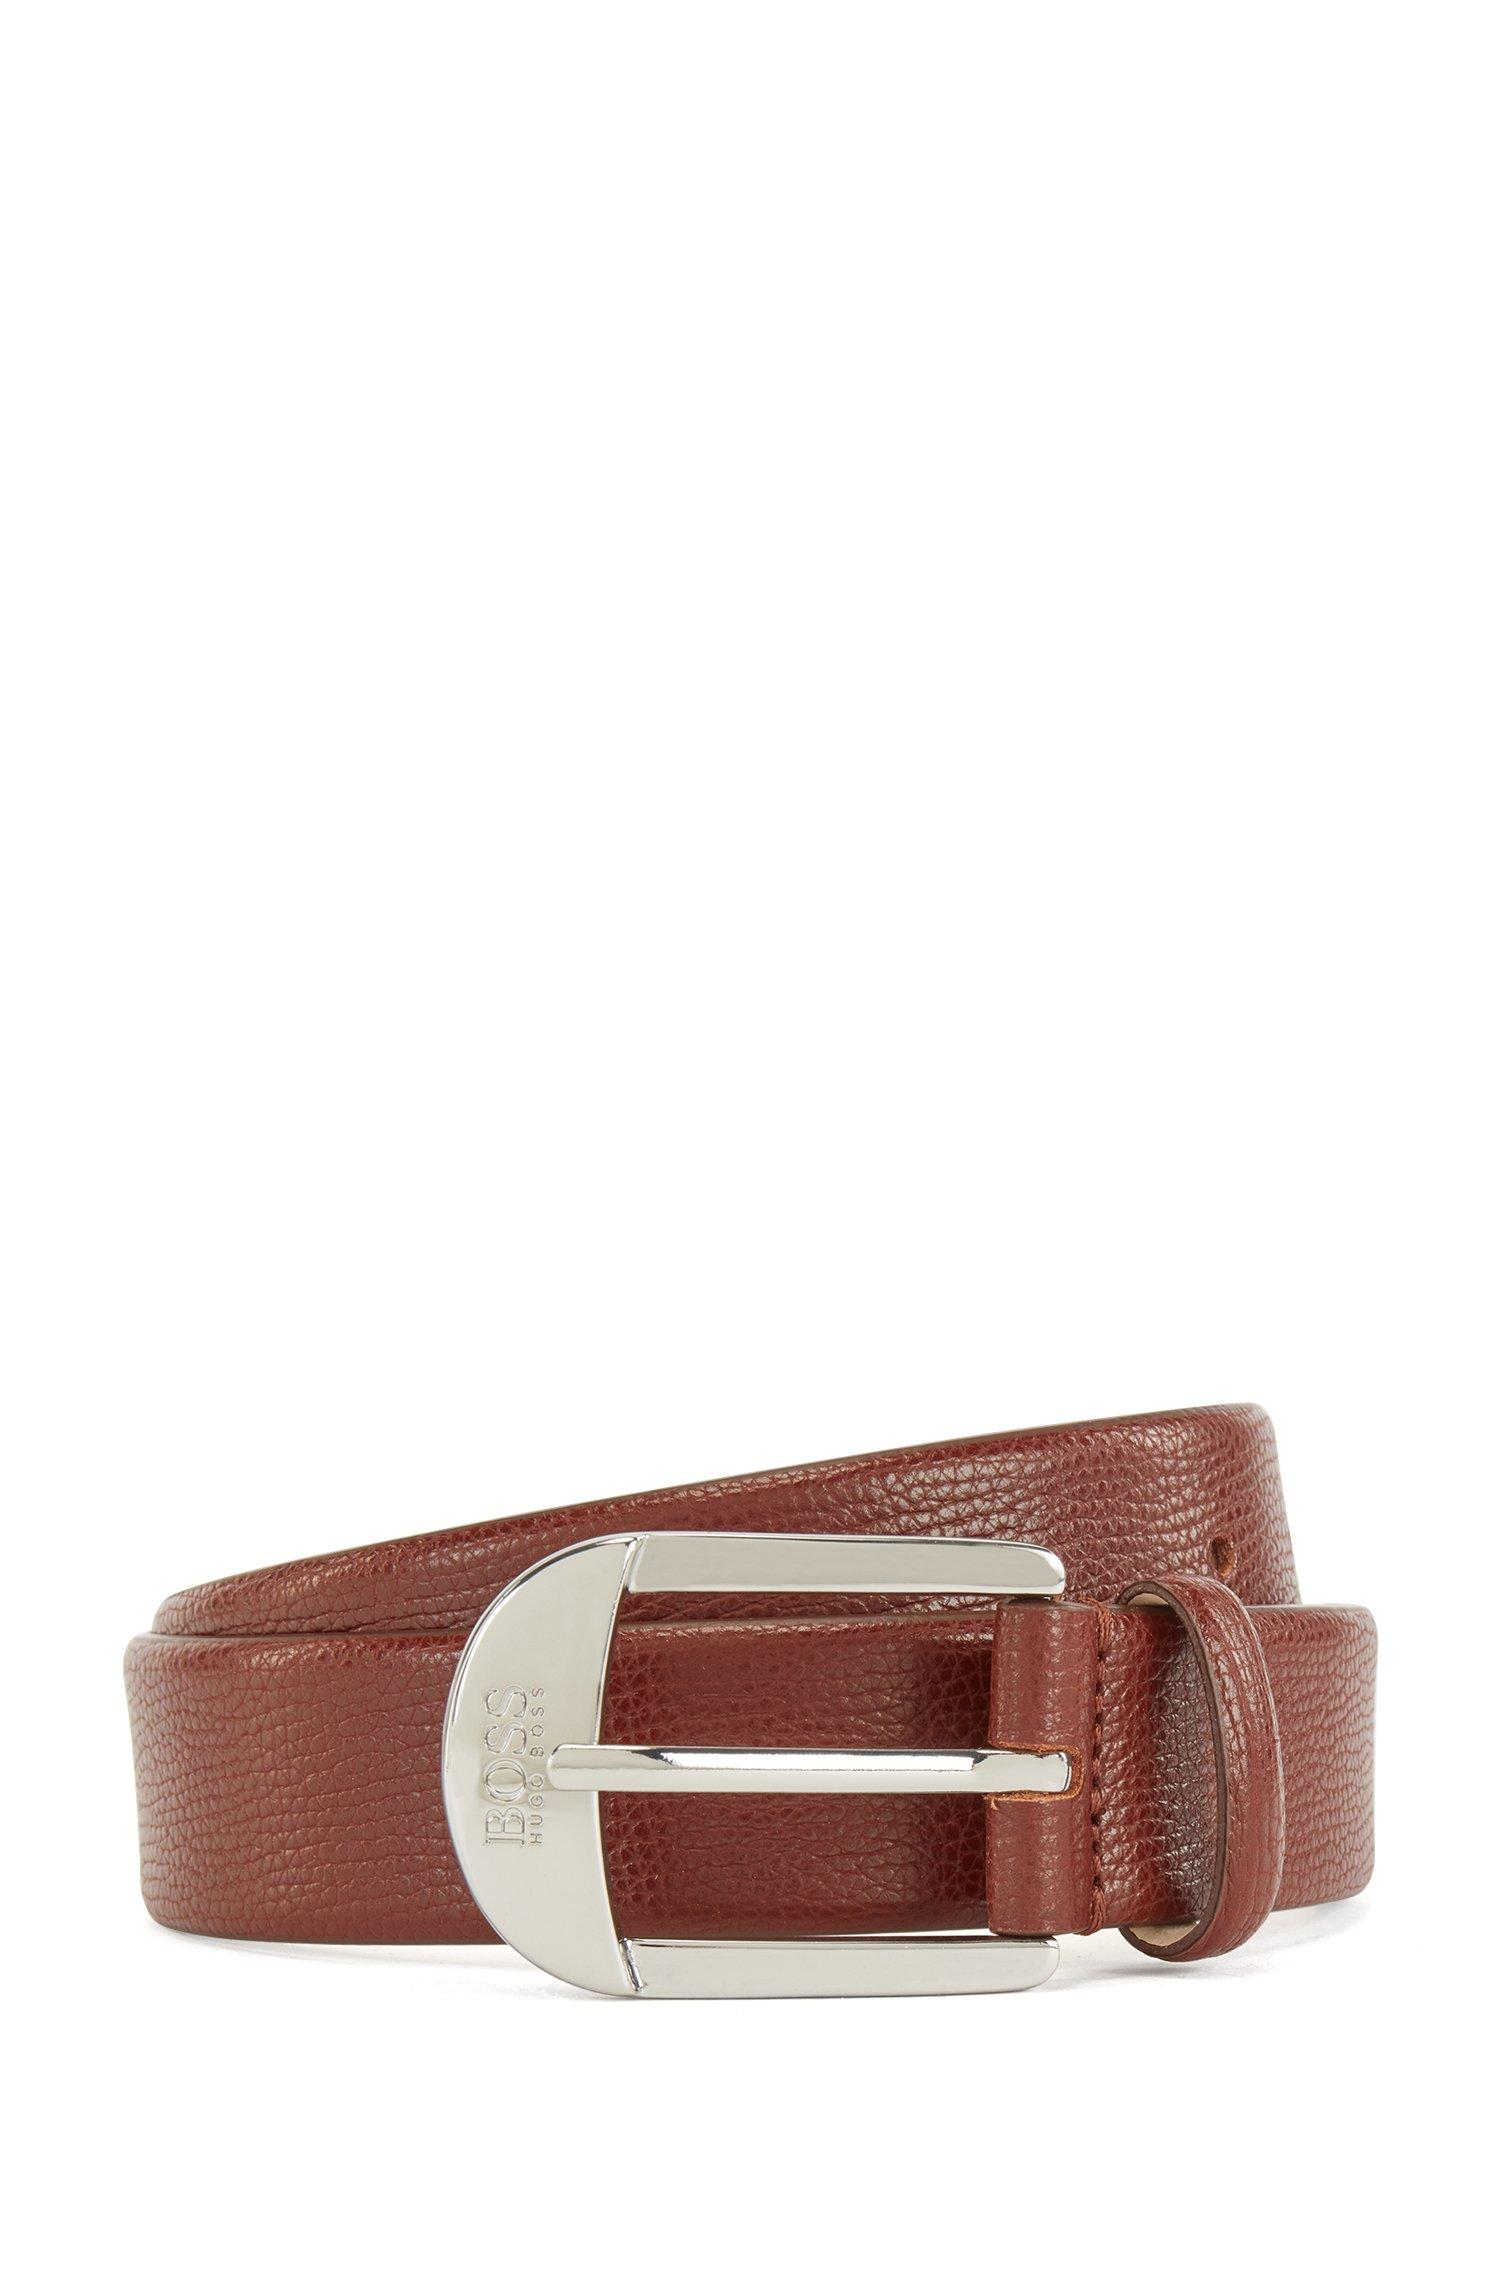 Pin-buckle belt in grained Italian leather, Brown